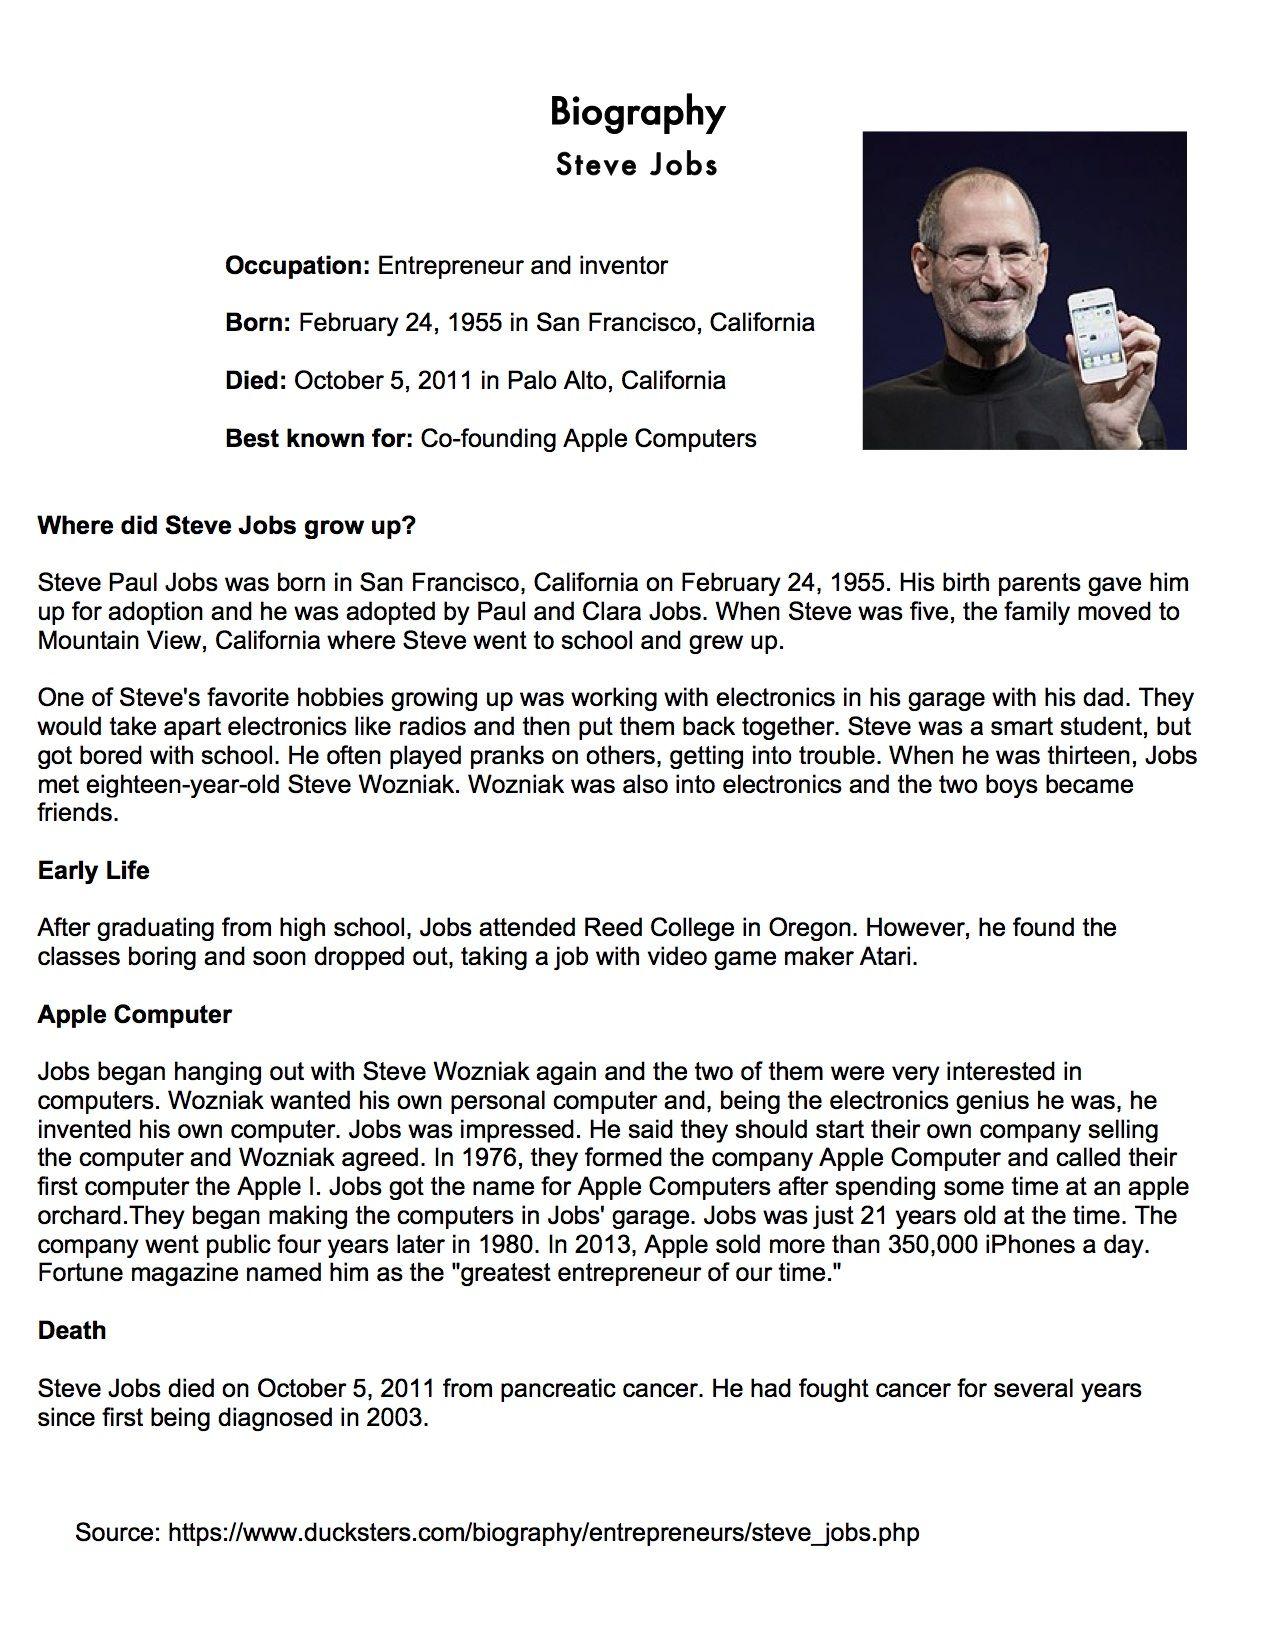 Esl Eal English Steve Jobs Biography Technology Apple Entrepreneur Vocabulary Iphone